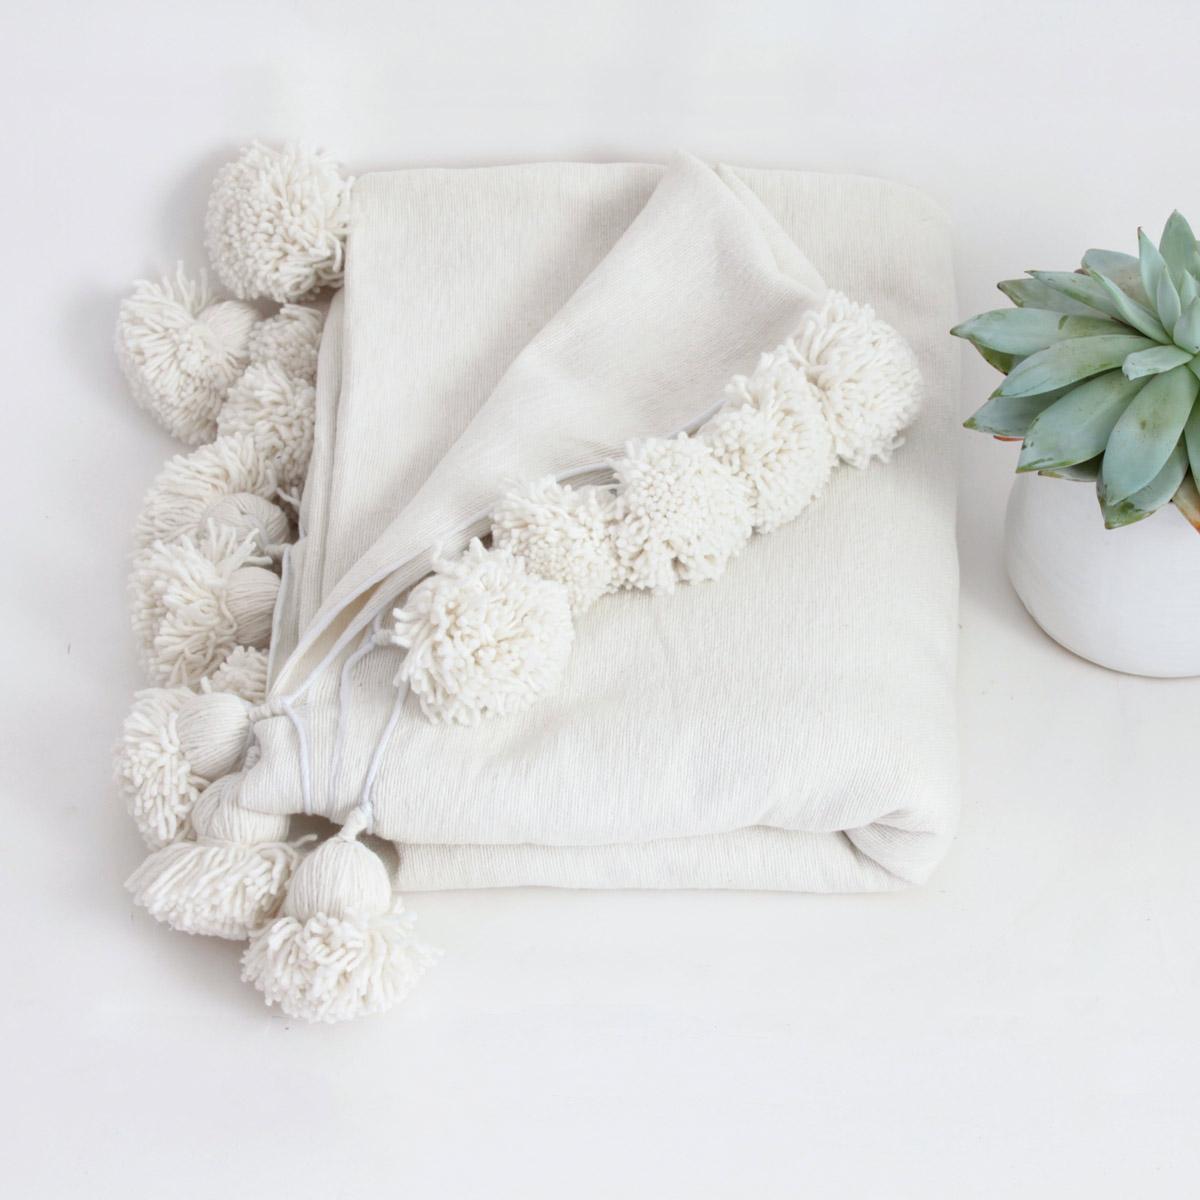 Moken - Pom Pom Blanket with Succulent